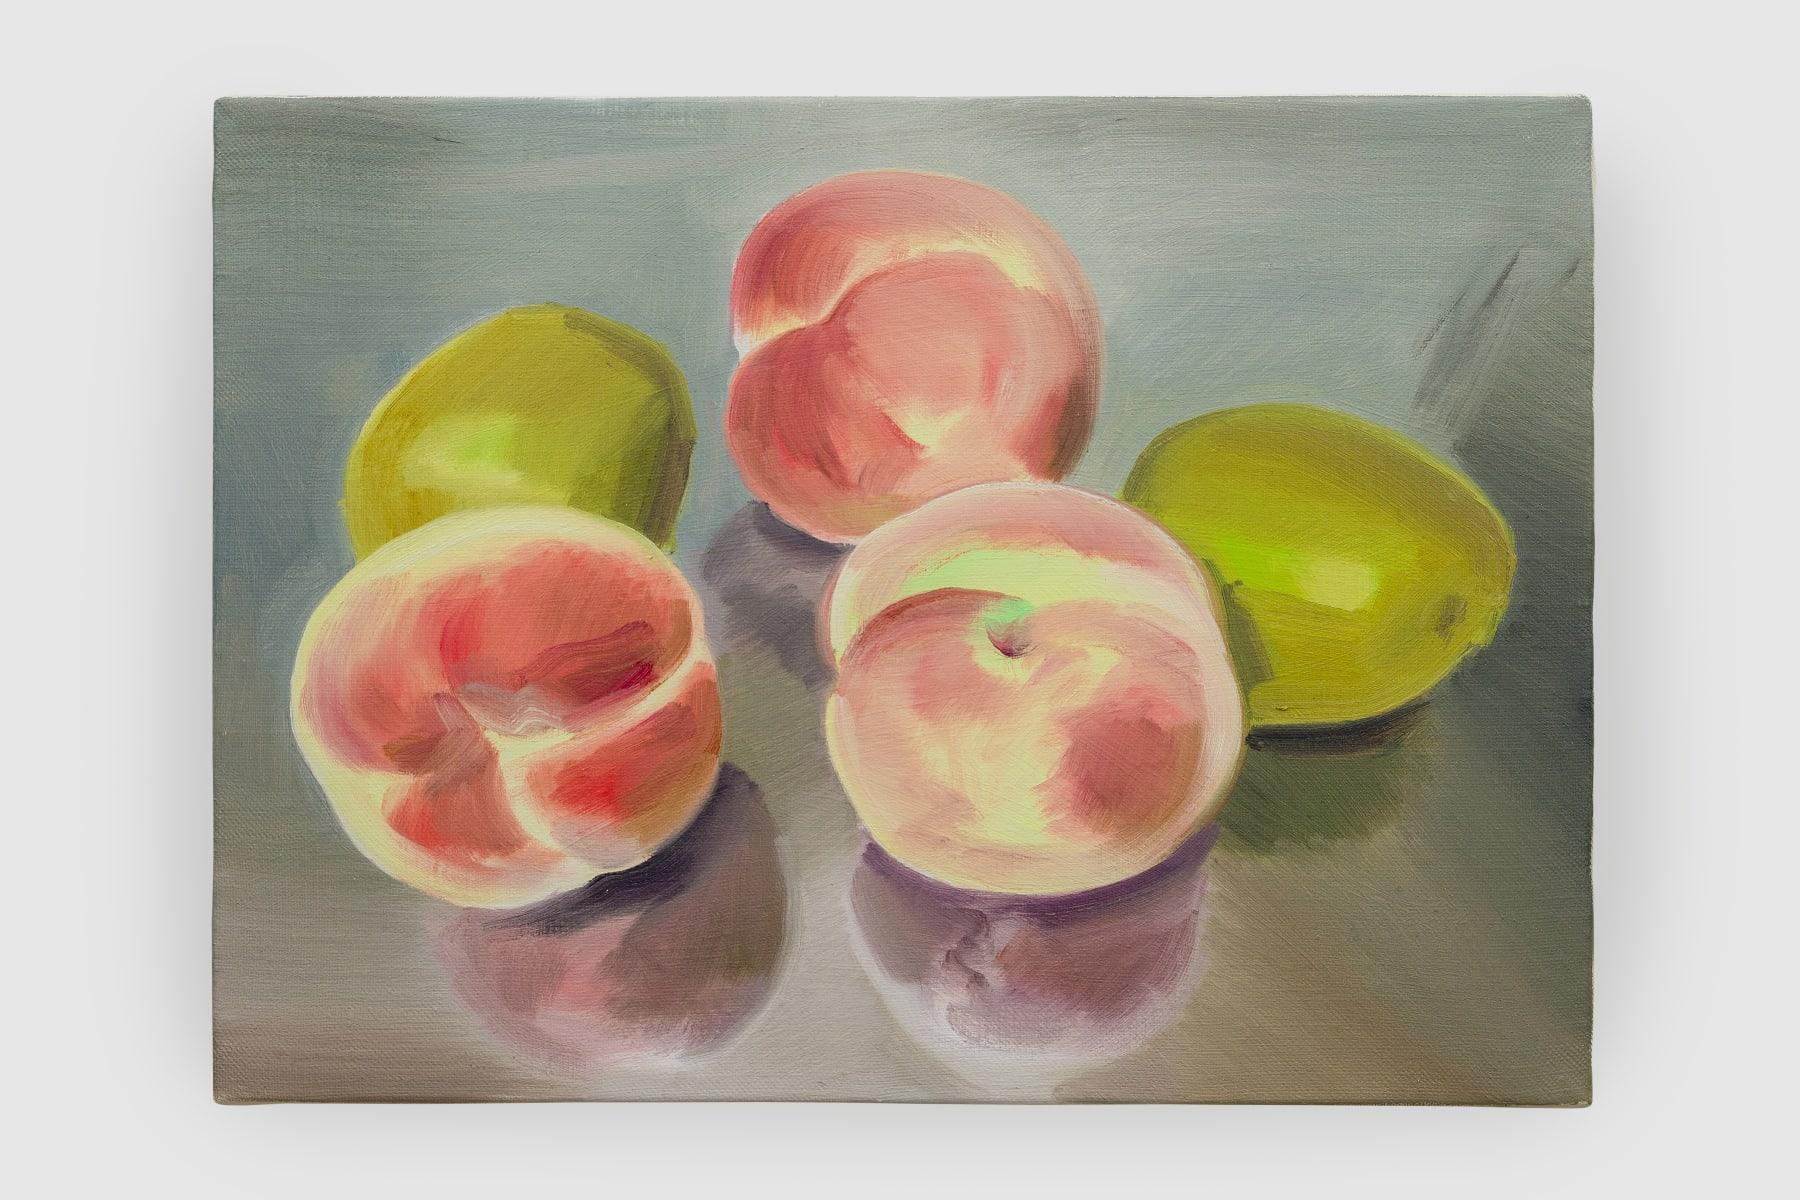 Ulala Imai, Fruits (Peaches and Kiwis), 2021